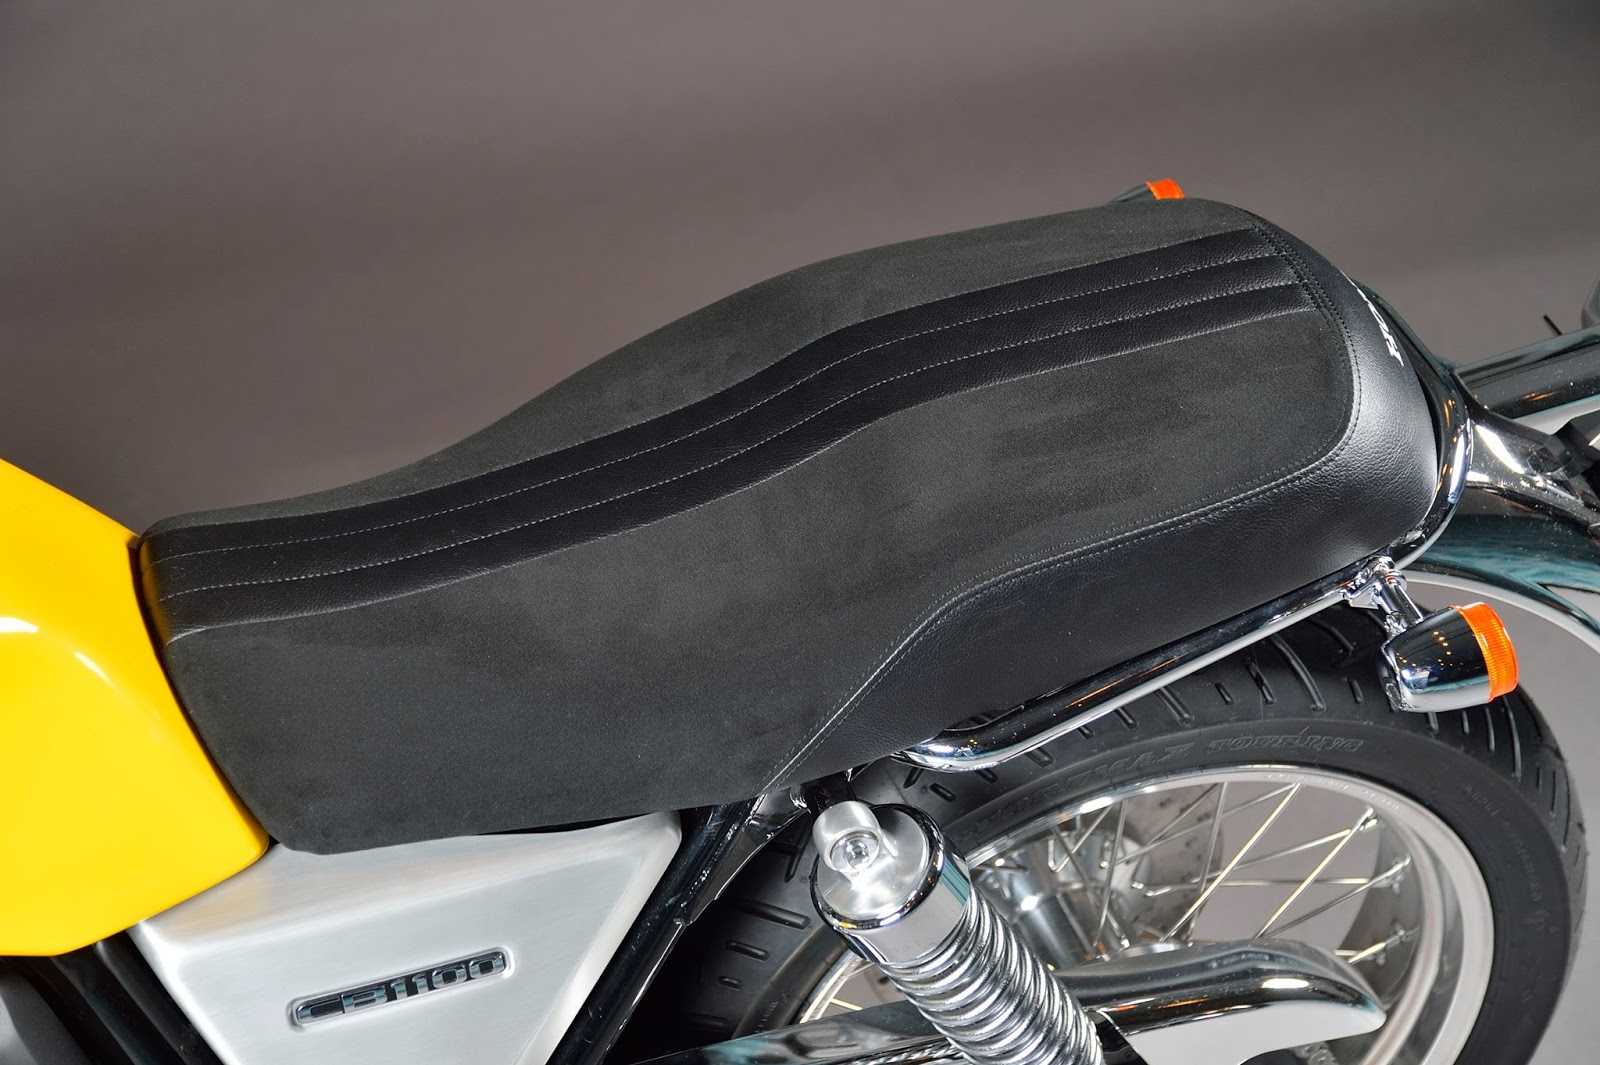 2017 Honda Cb 1100 Motorcycle